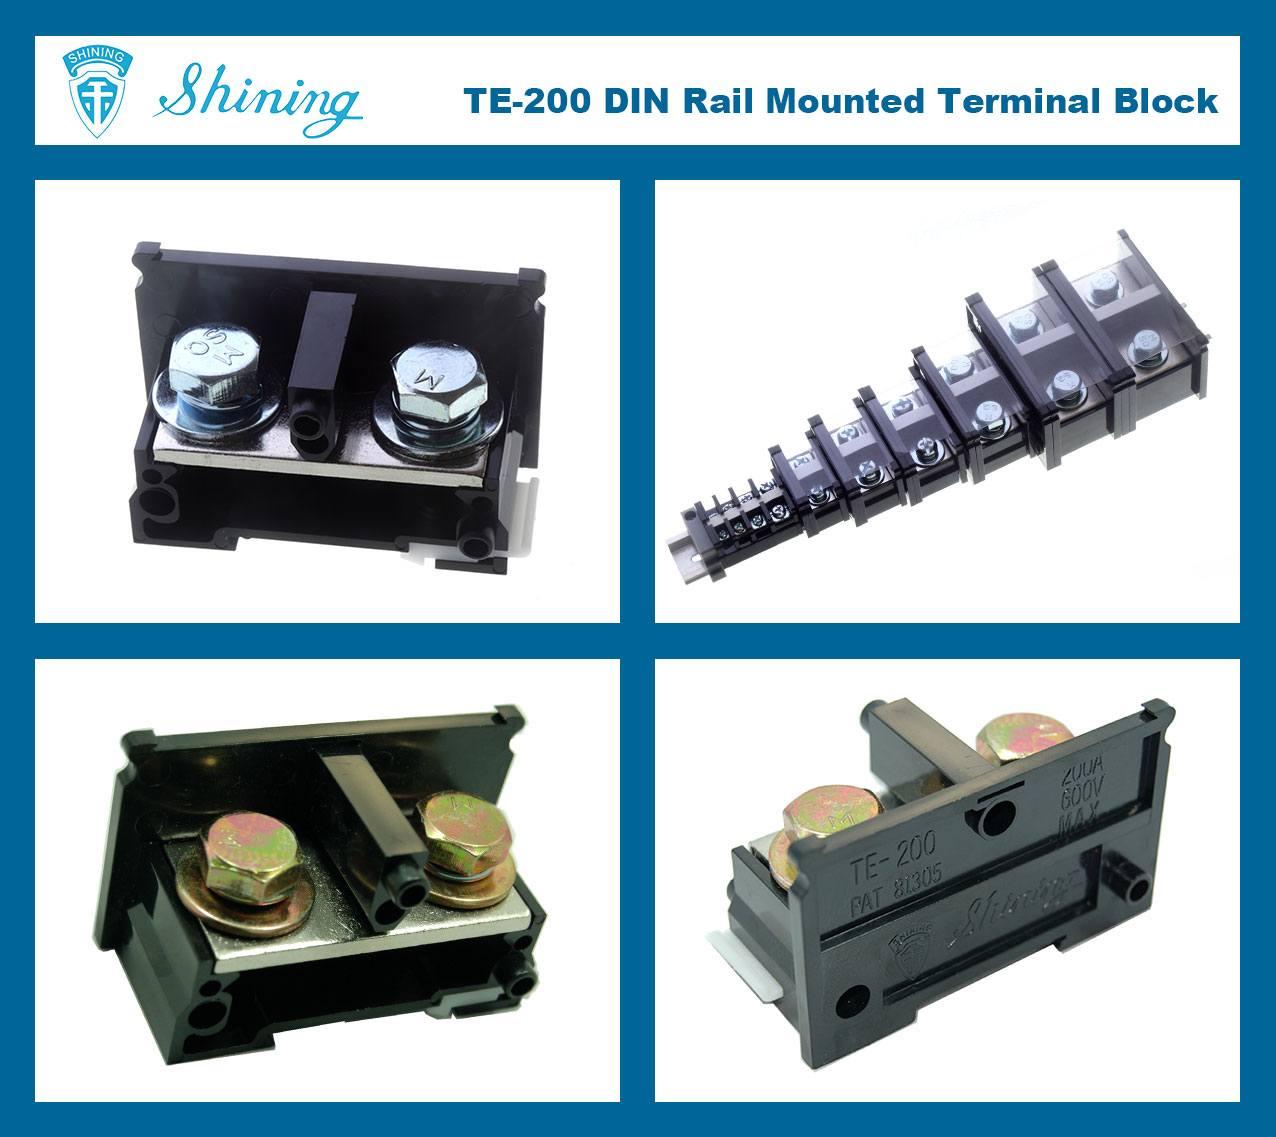 SHINING-TE-200 35mm Din Rail Mounted Assembly Type 600V 200A Terminal Strip